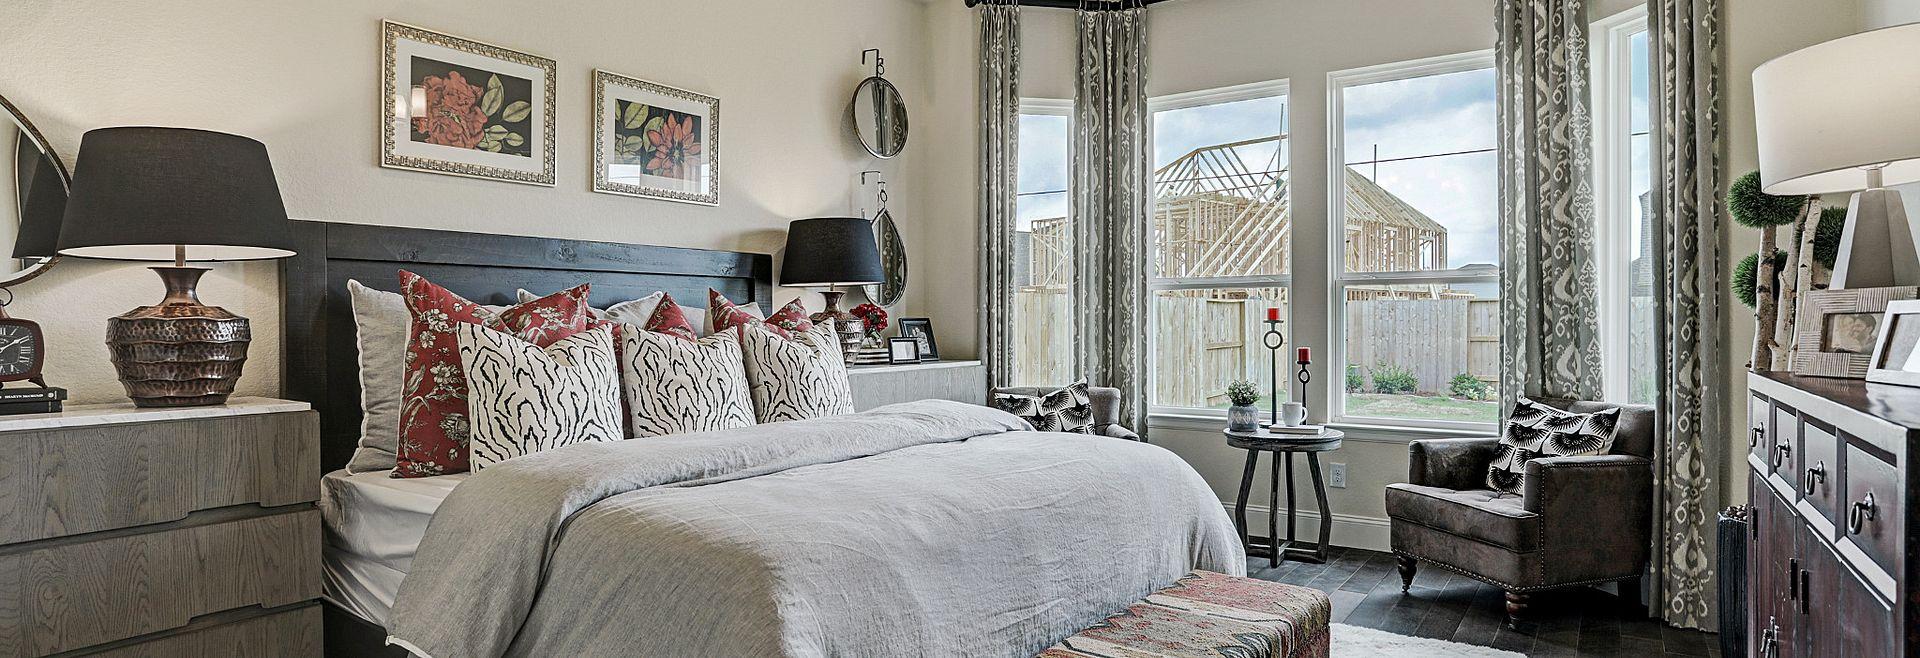 Plan 4125 Master Bedroom Meridiana Model